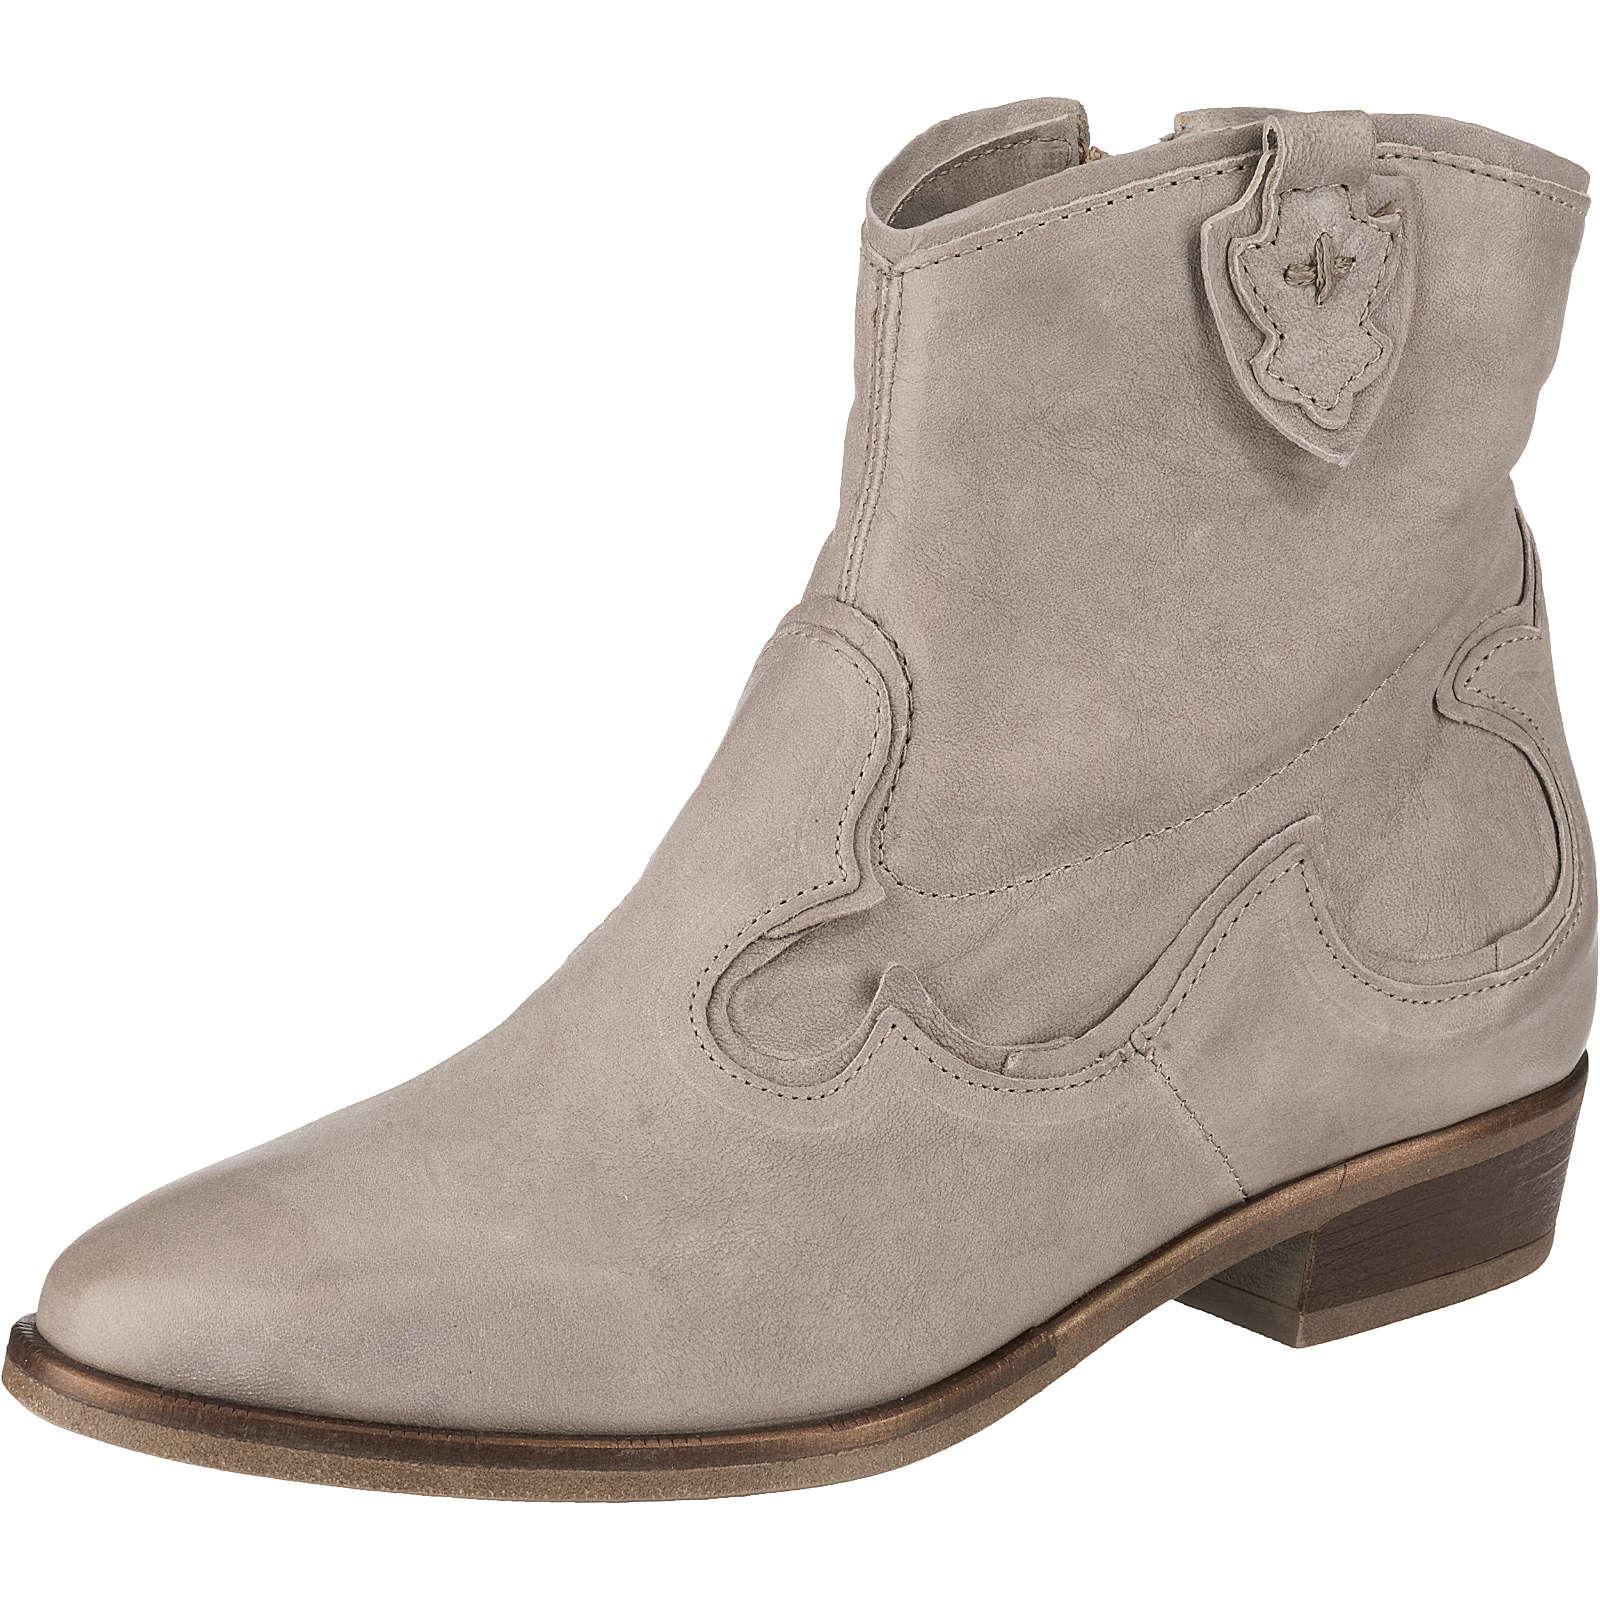 MJUS Biker Boots grau Damen Gr. 36